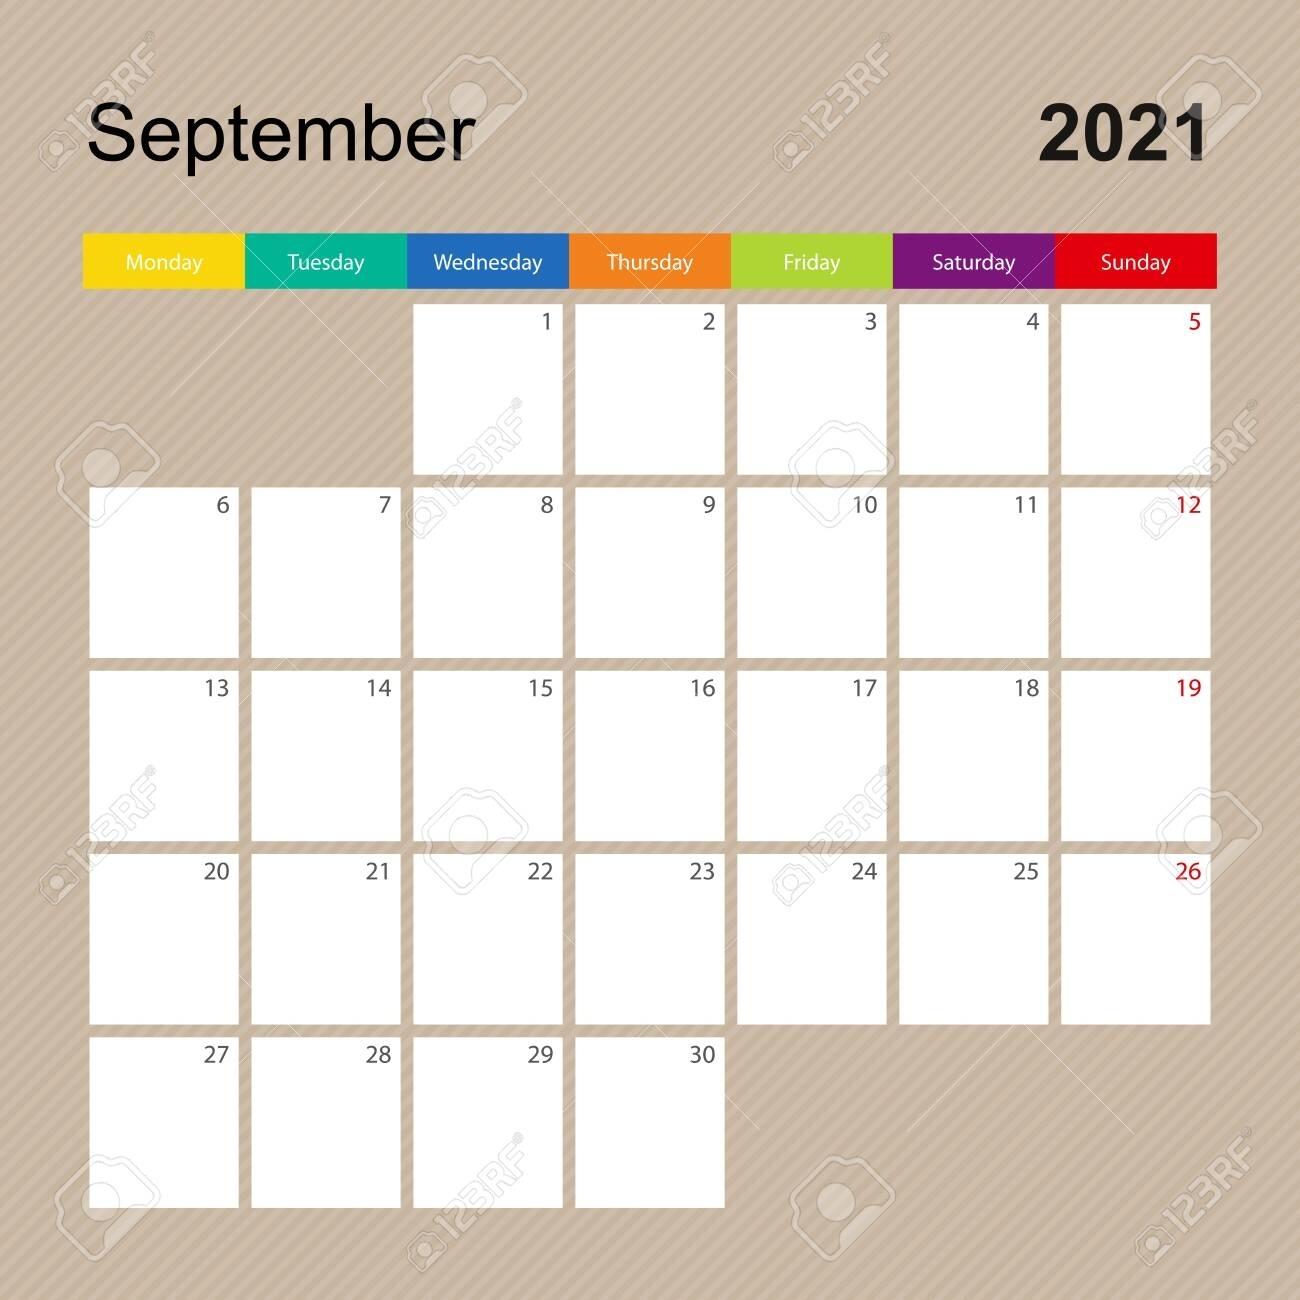 Collect Clip Art September 2021